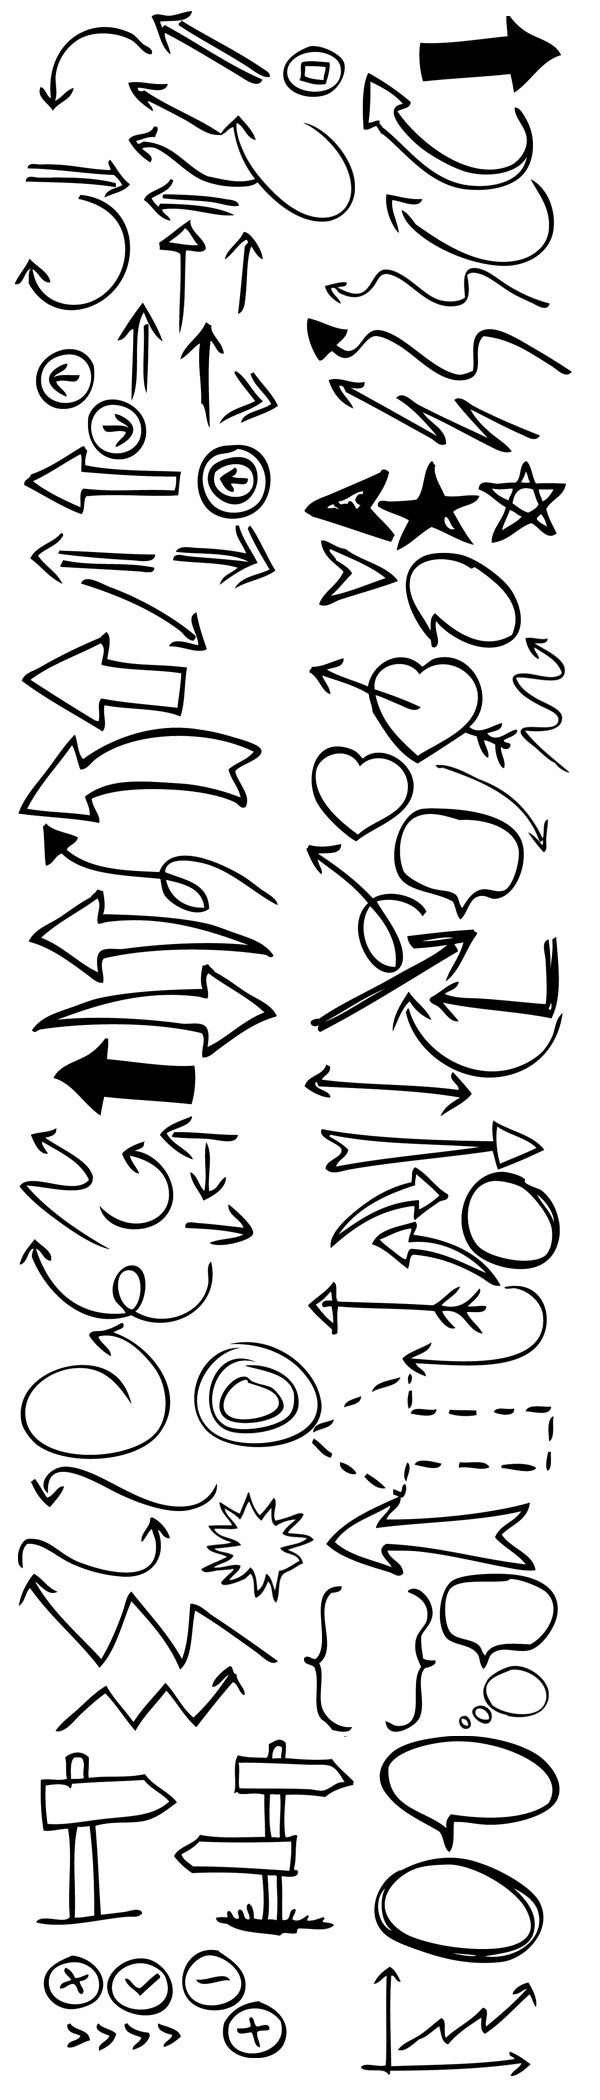 90 Hand drawn arrow & symbol photoshop brushes - free